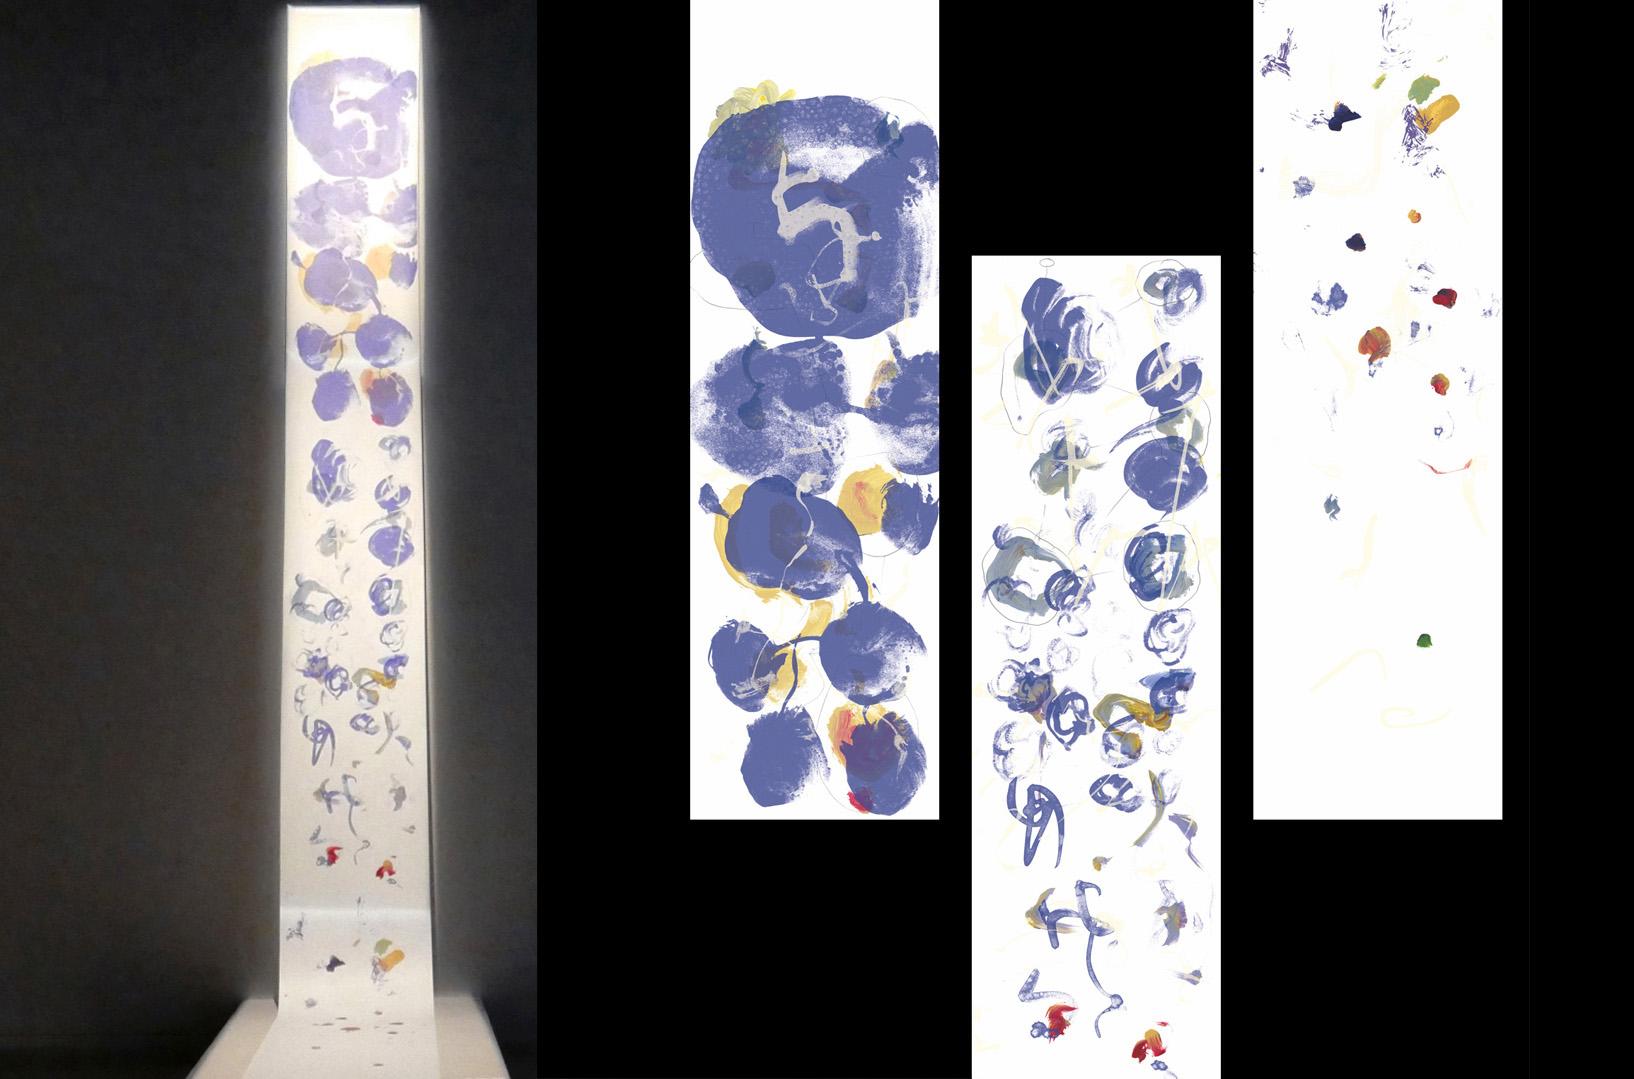 Seoul Calligraphy Art Museum